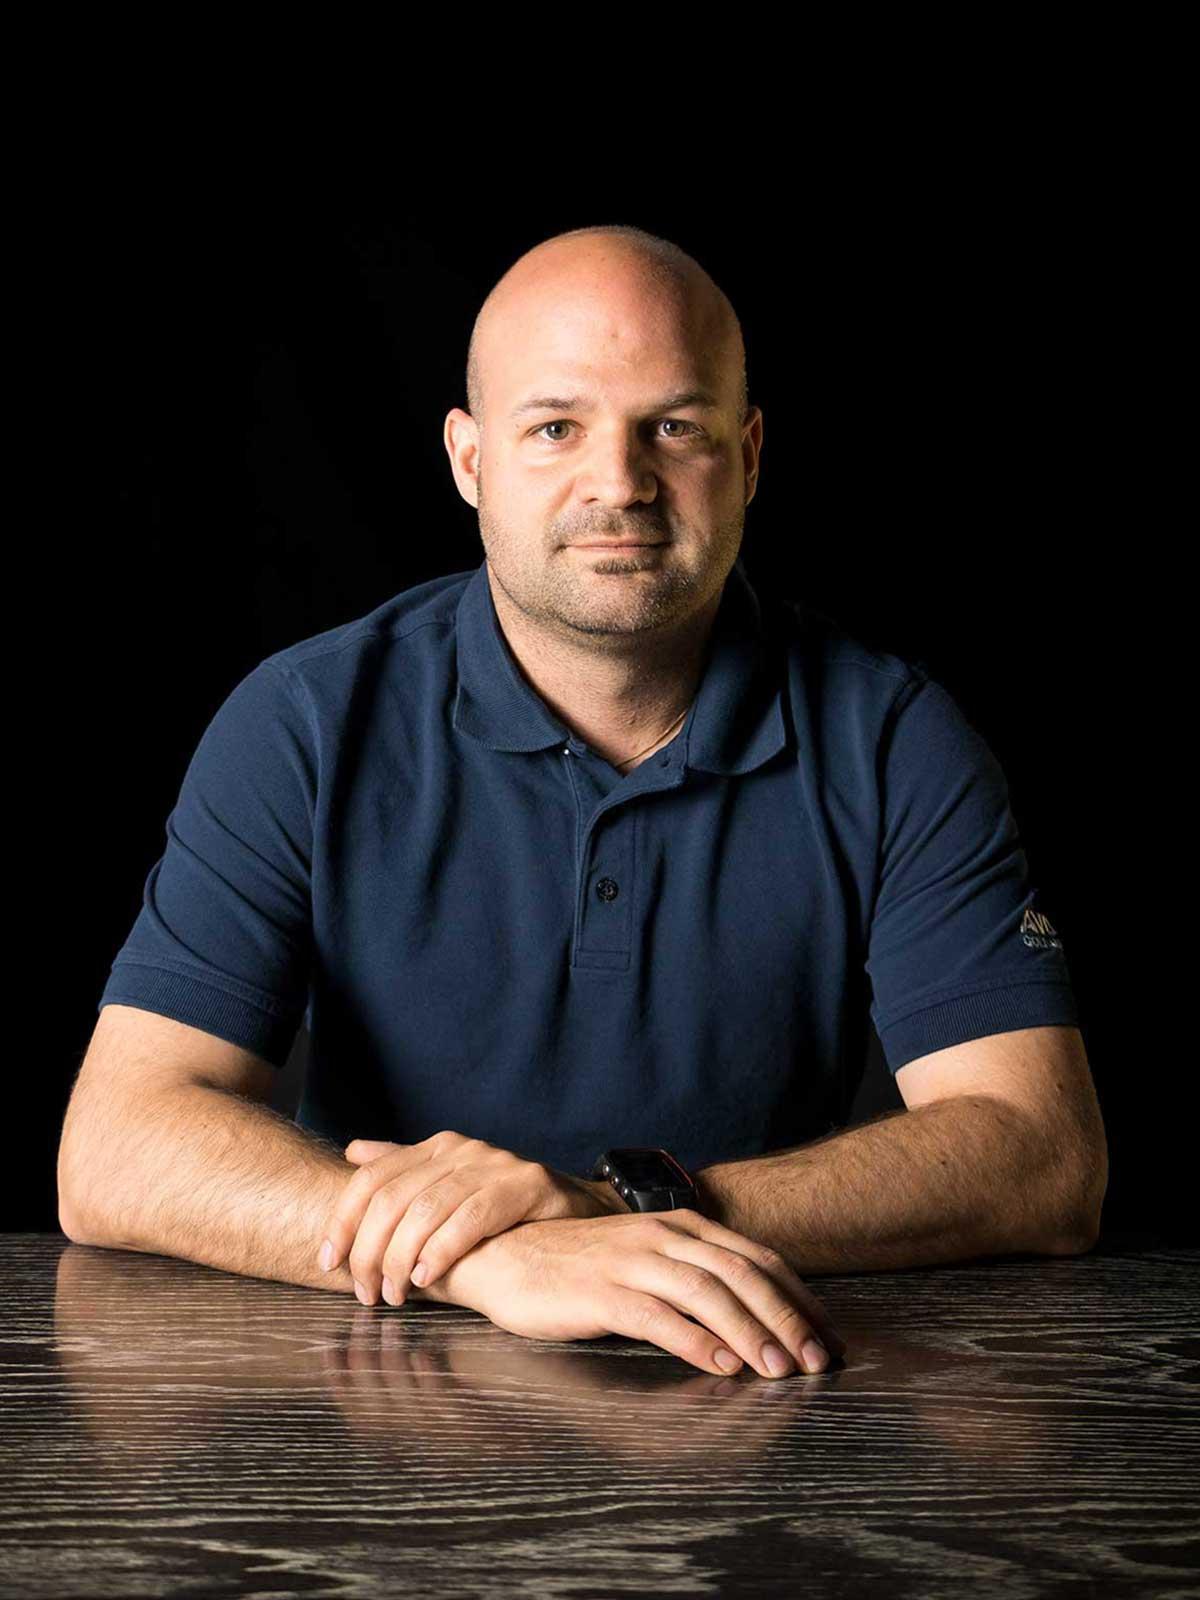 patrick hölterhoff, Responsable d'équipe et formation, avd goldach sa